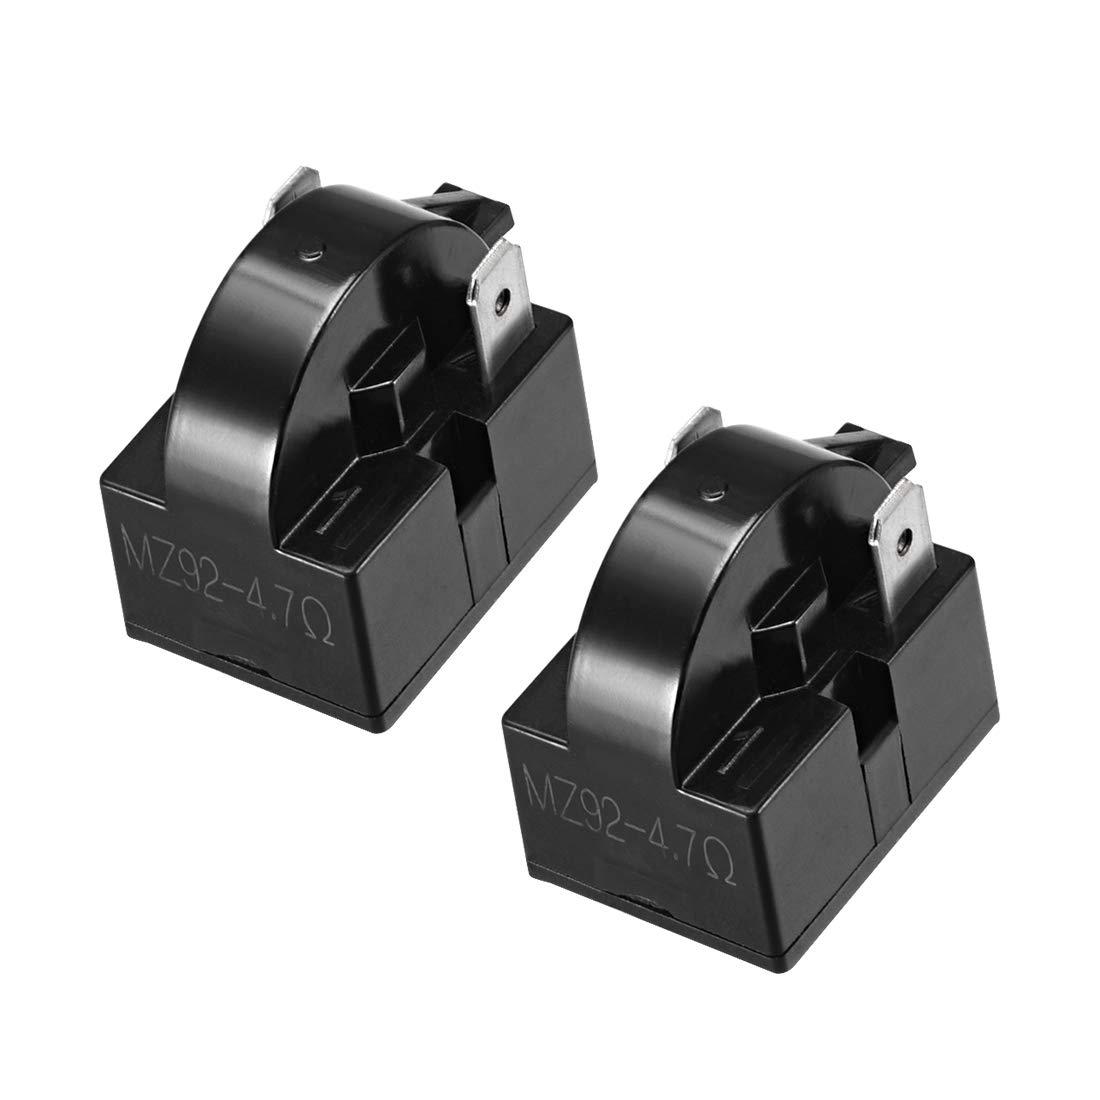 uxcell 2 Pcs 4.7 Ohm 2 Pin Refrigerator PTC Starter Relay Black